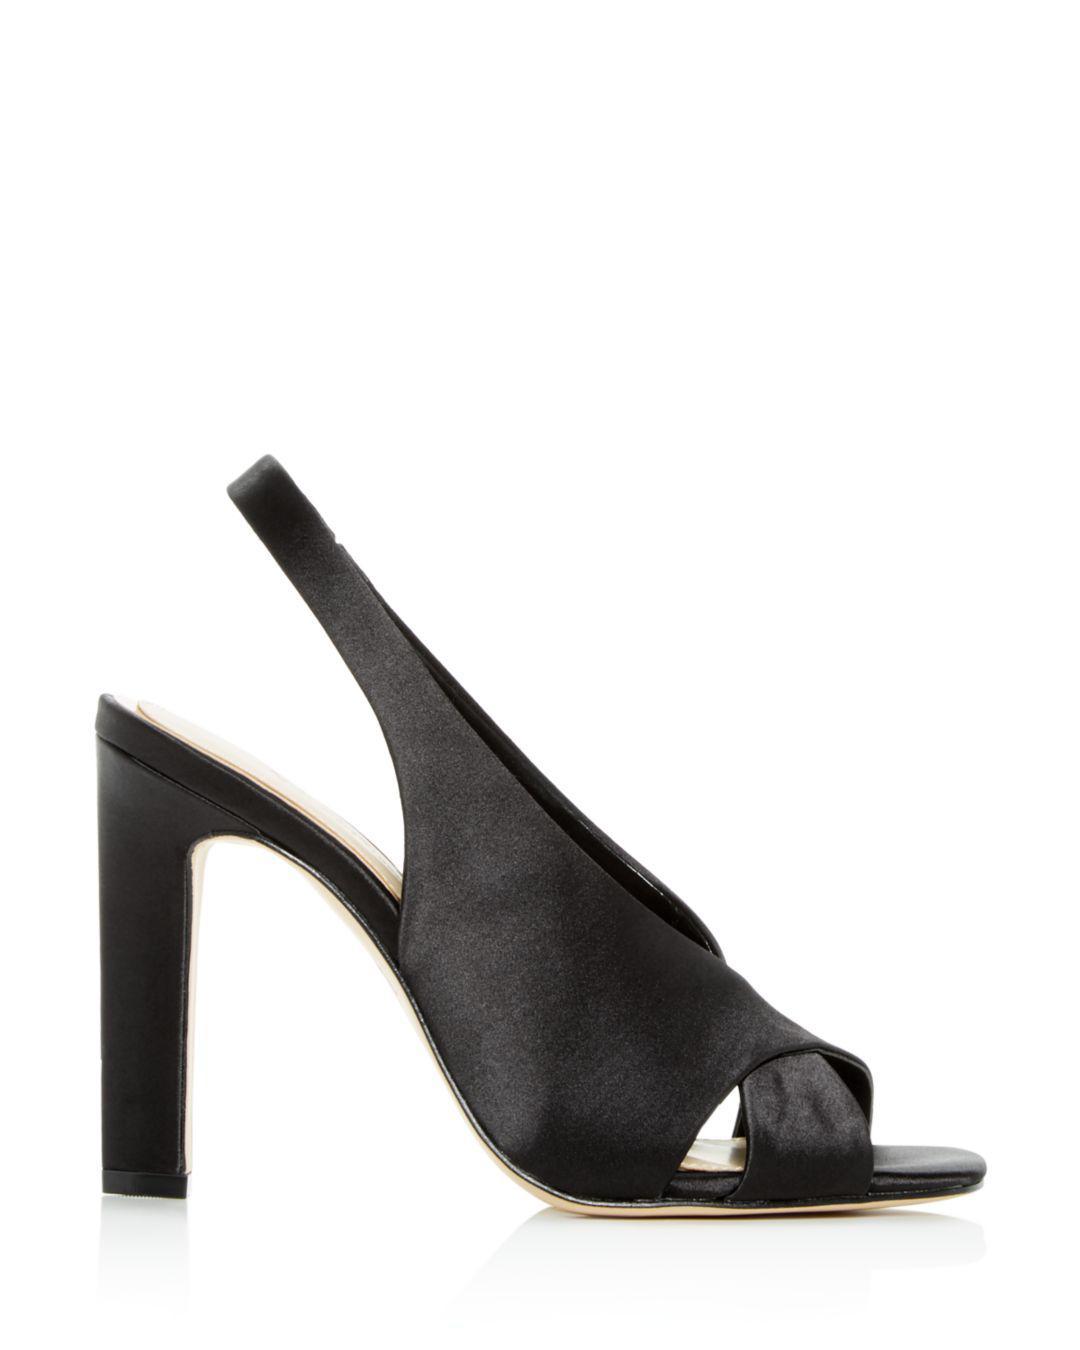 d16613fb58f Lyst - Imagine Vince Camuto Women s Wrennie Slingback High-heel Sandals in  Black - Save 40%